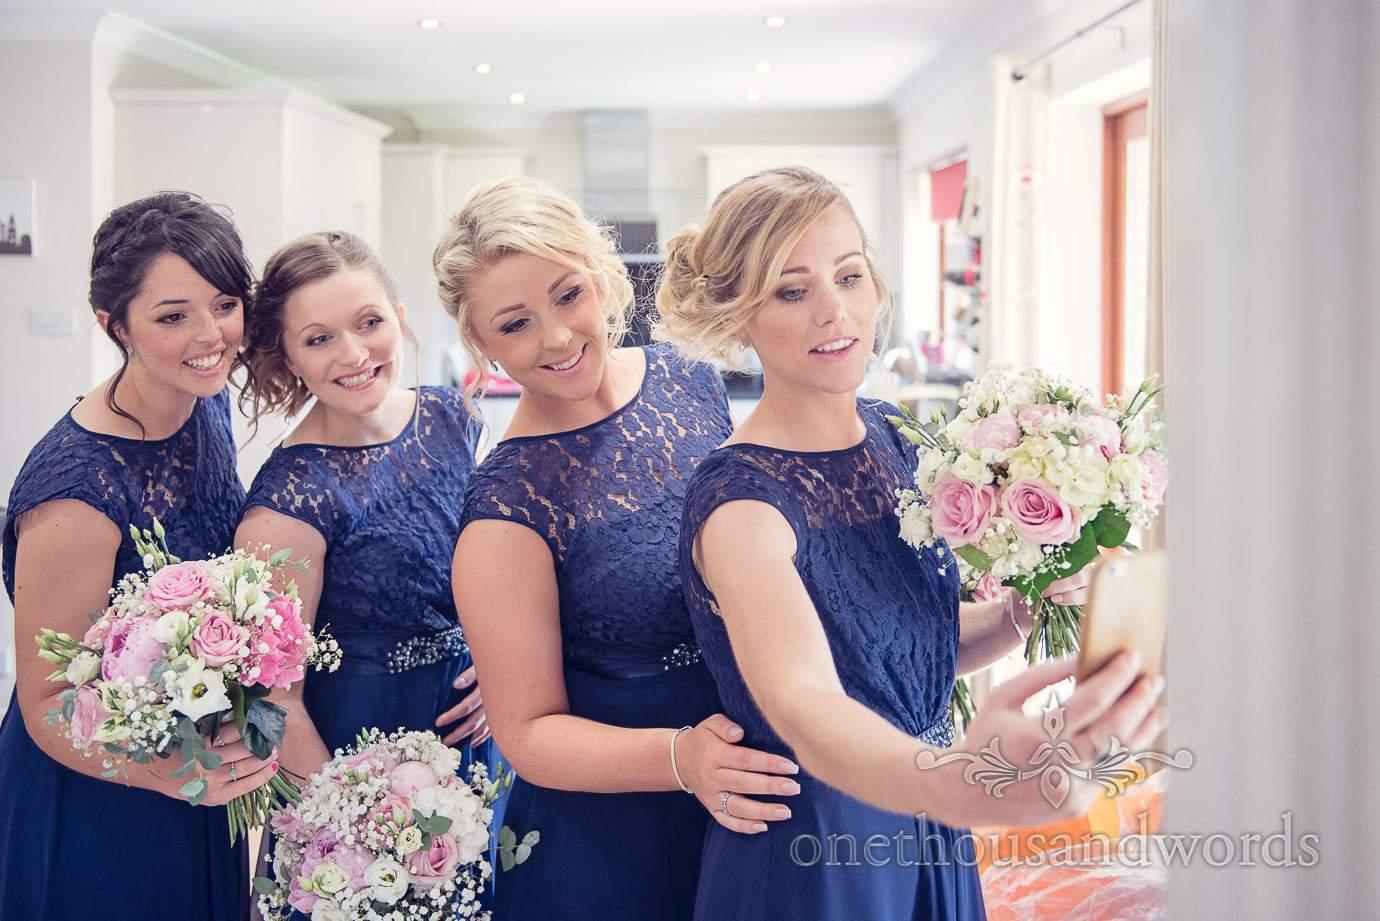 Bridemaids in blue bridesmaids dresses take selfie on wedding morning